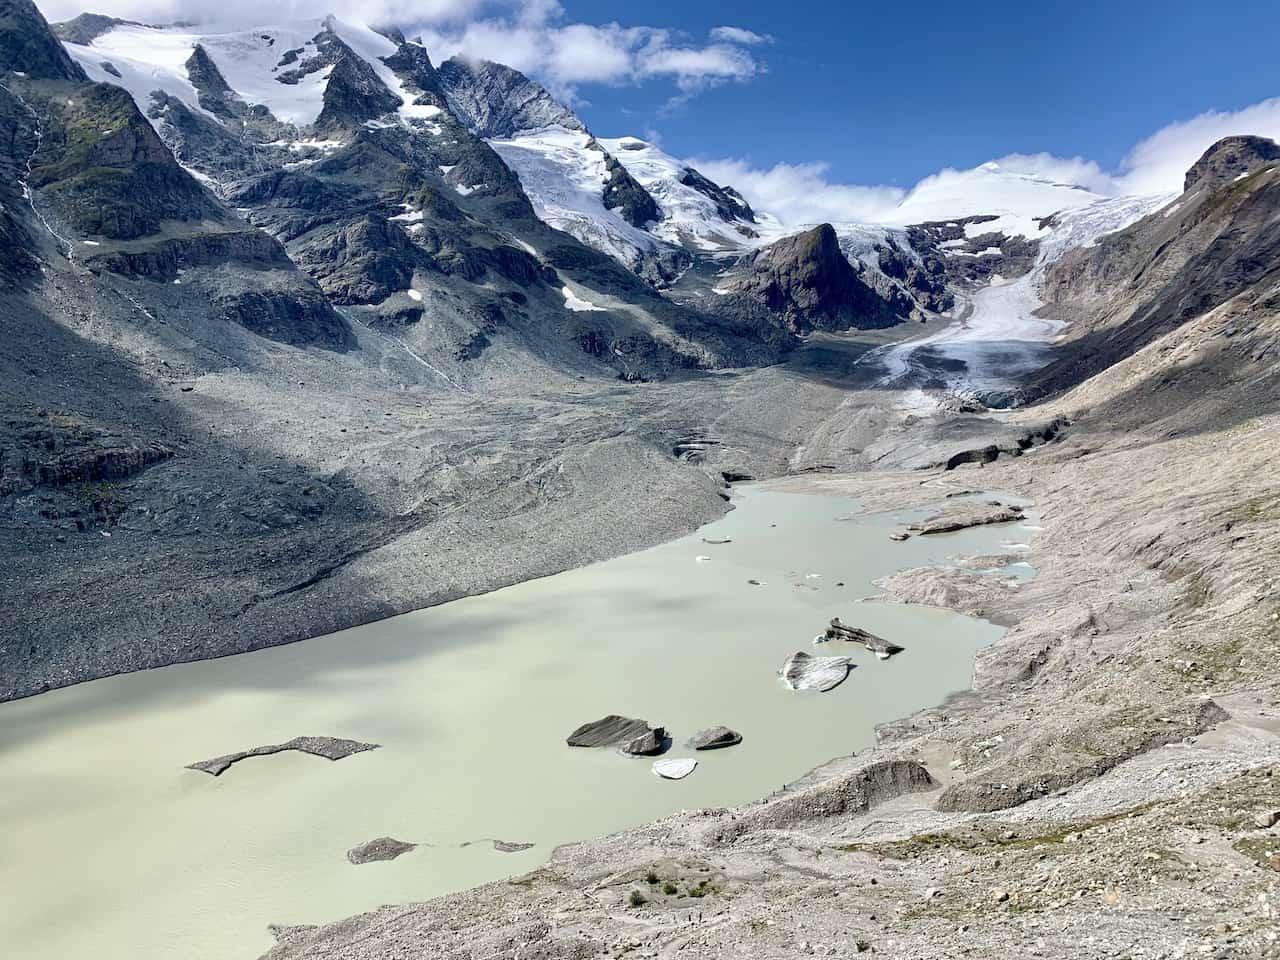 Pasterze Glacier Franz Josefs